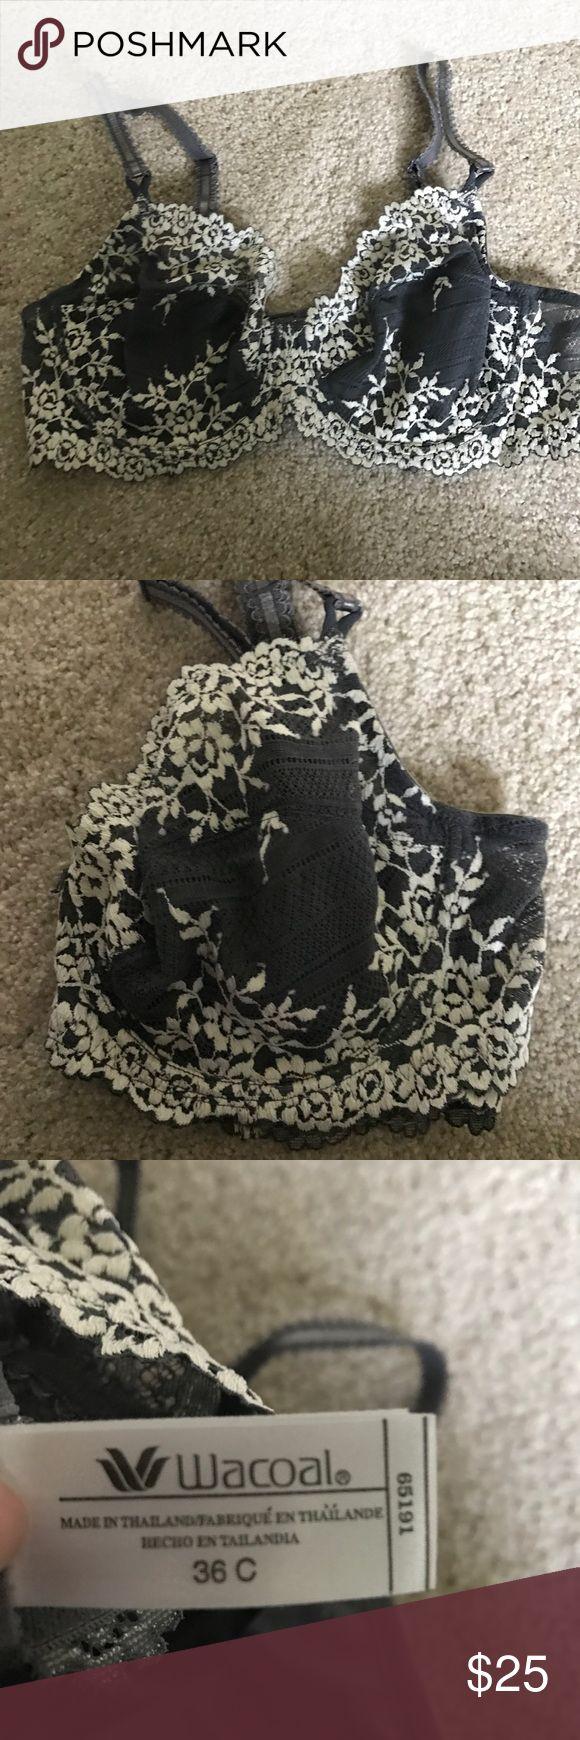 BRAND NEW Wacoal bra Cute lace wacoal bra. Size 36C. Never worn Wacoal Intimates & Sleepwear Bras